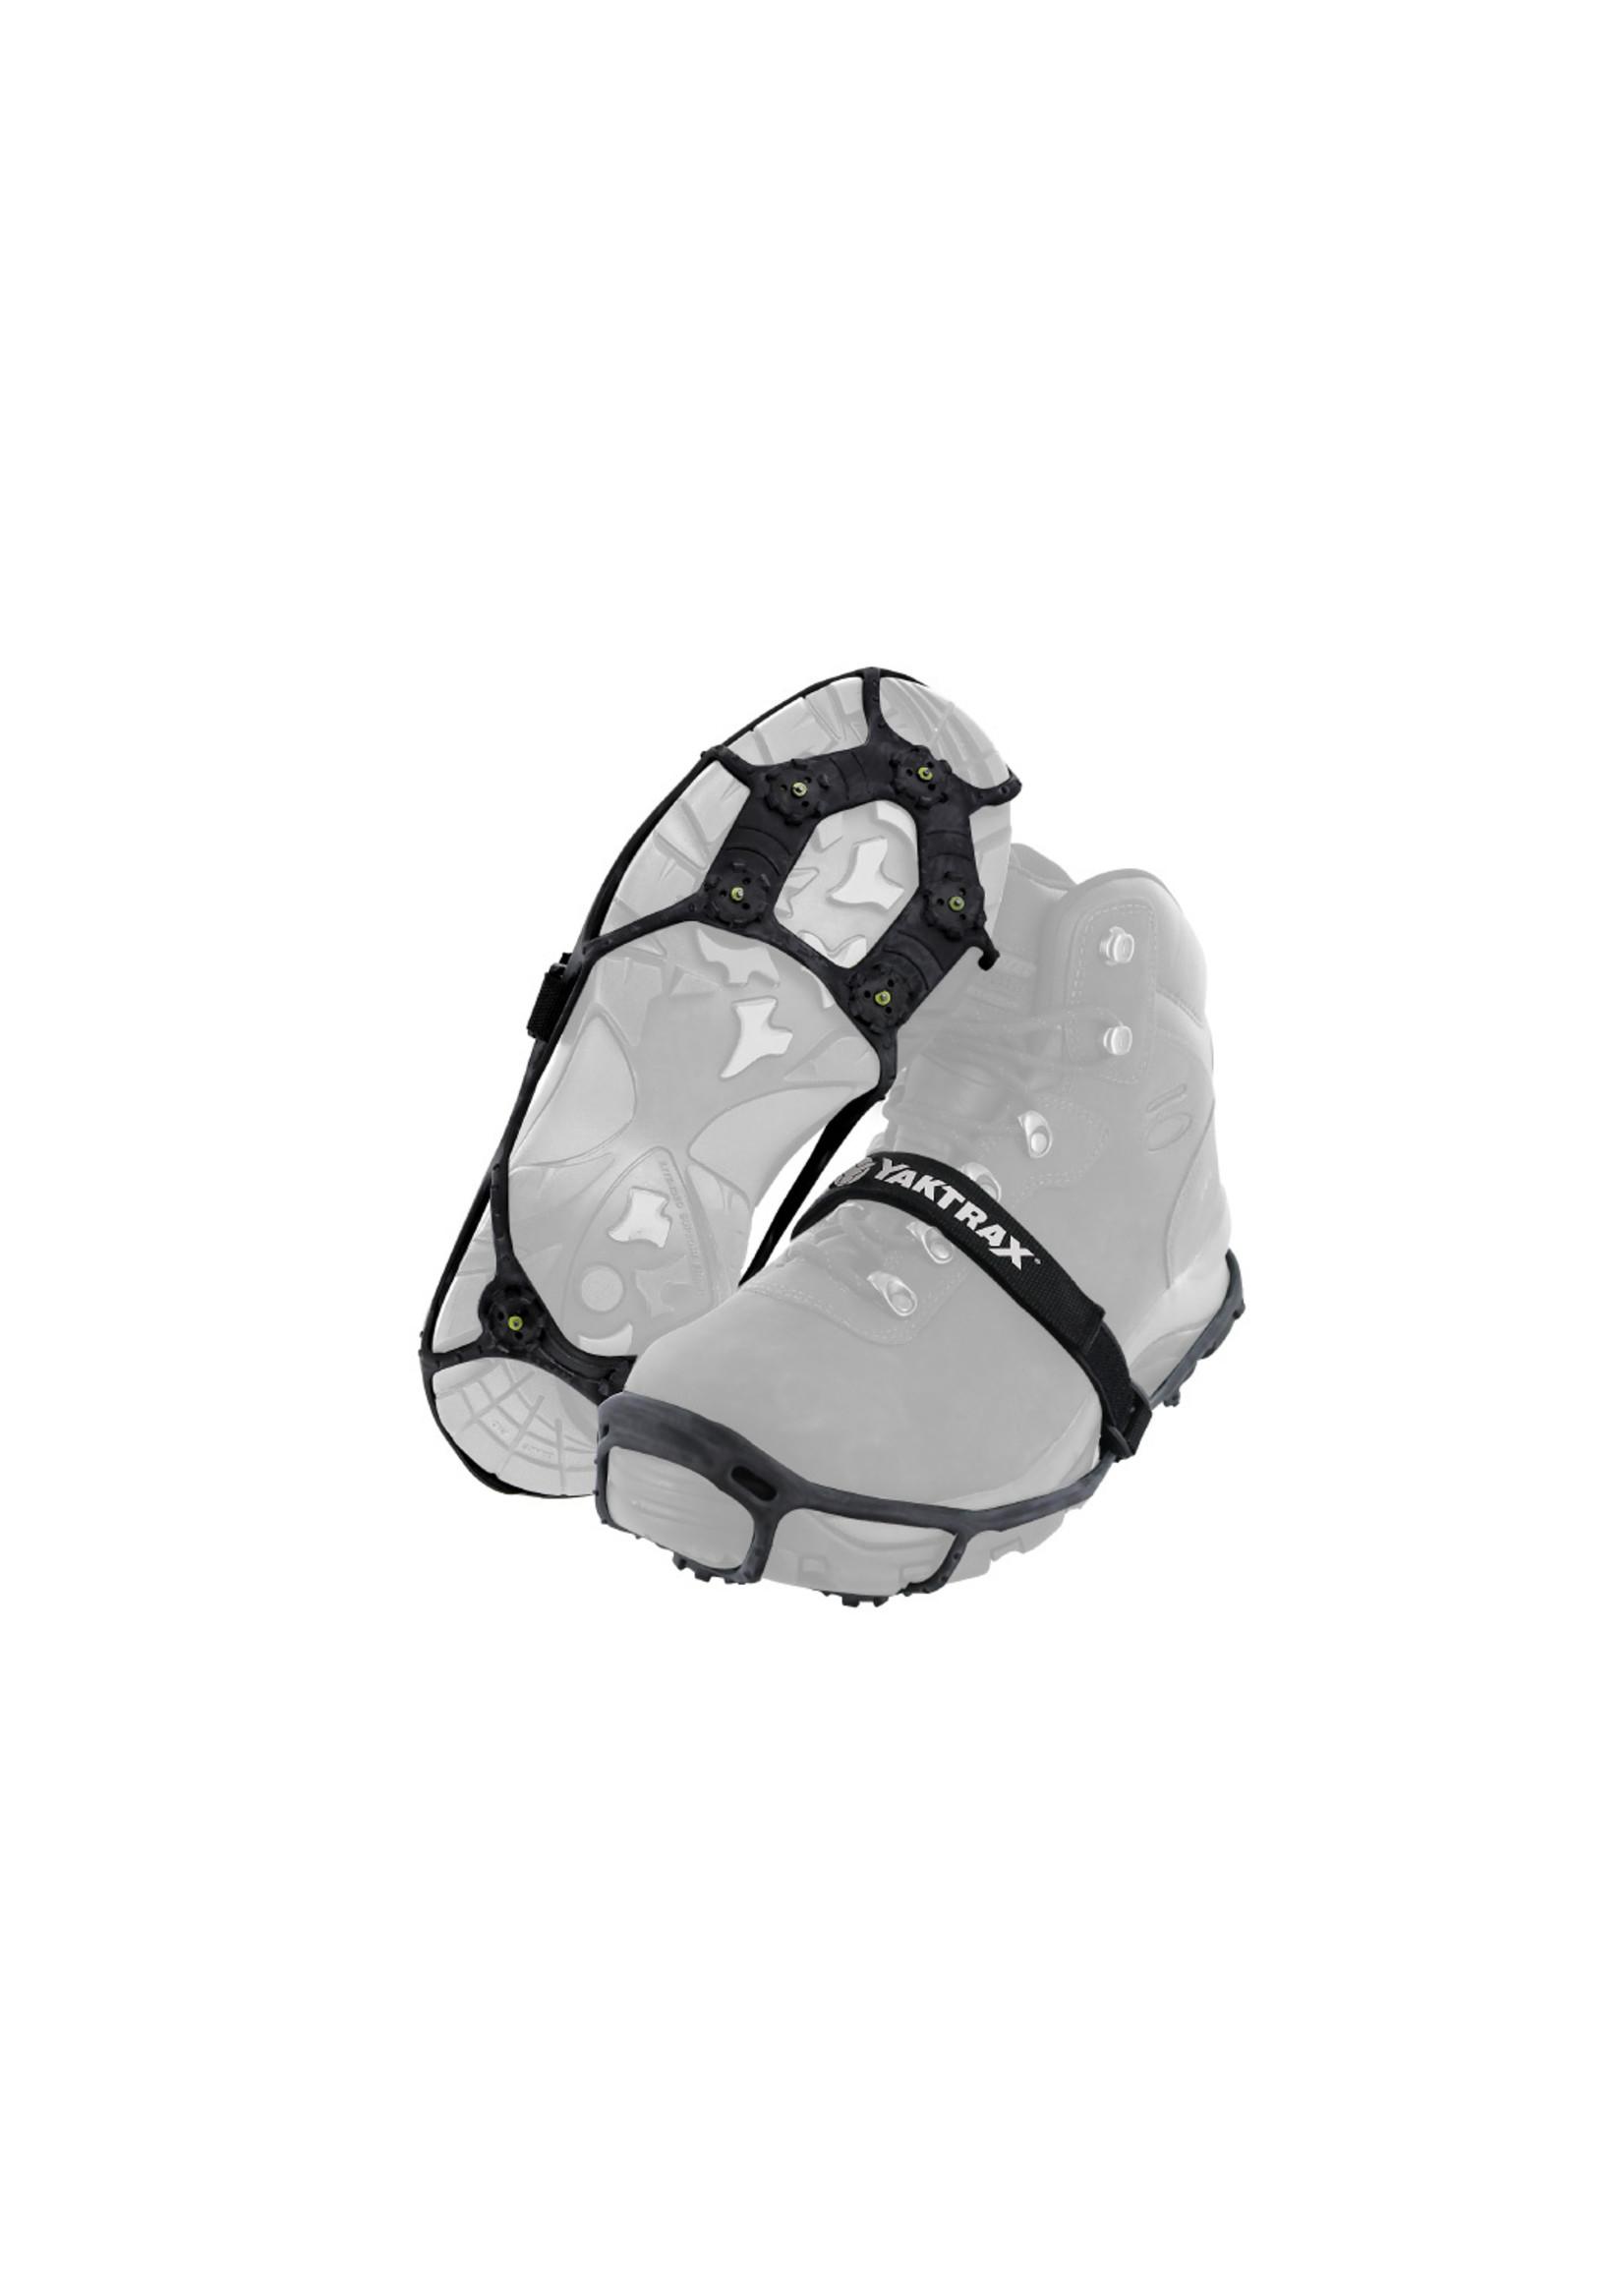 Yaktrax Yaktrax Ice Cleat Spike Blk S/MD